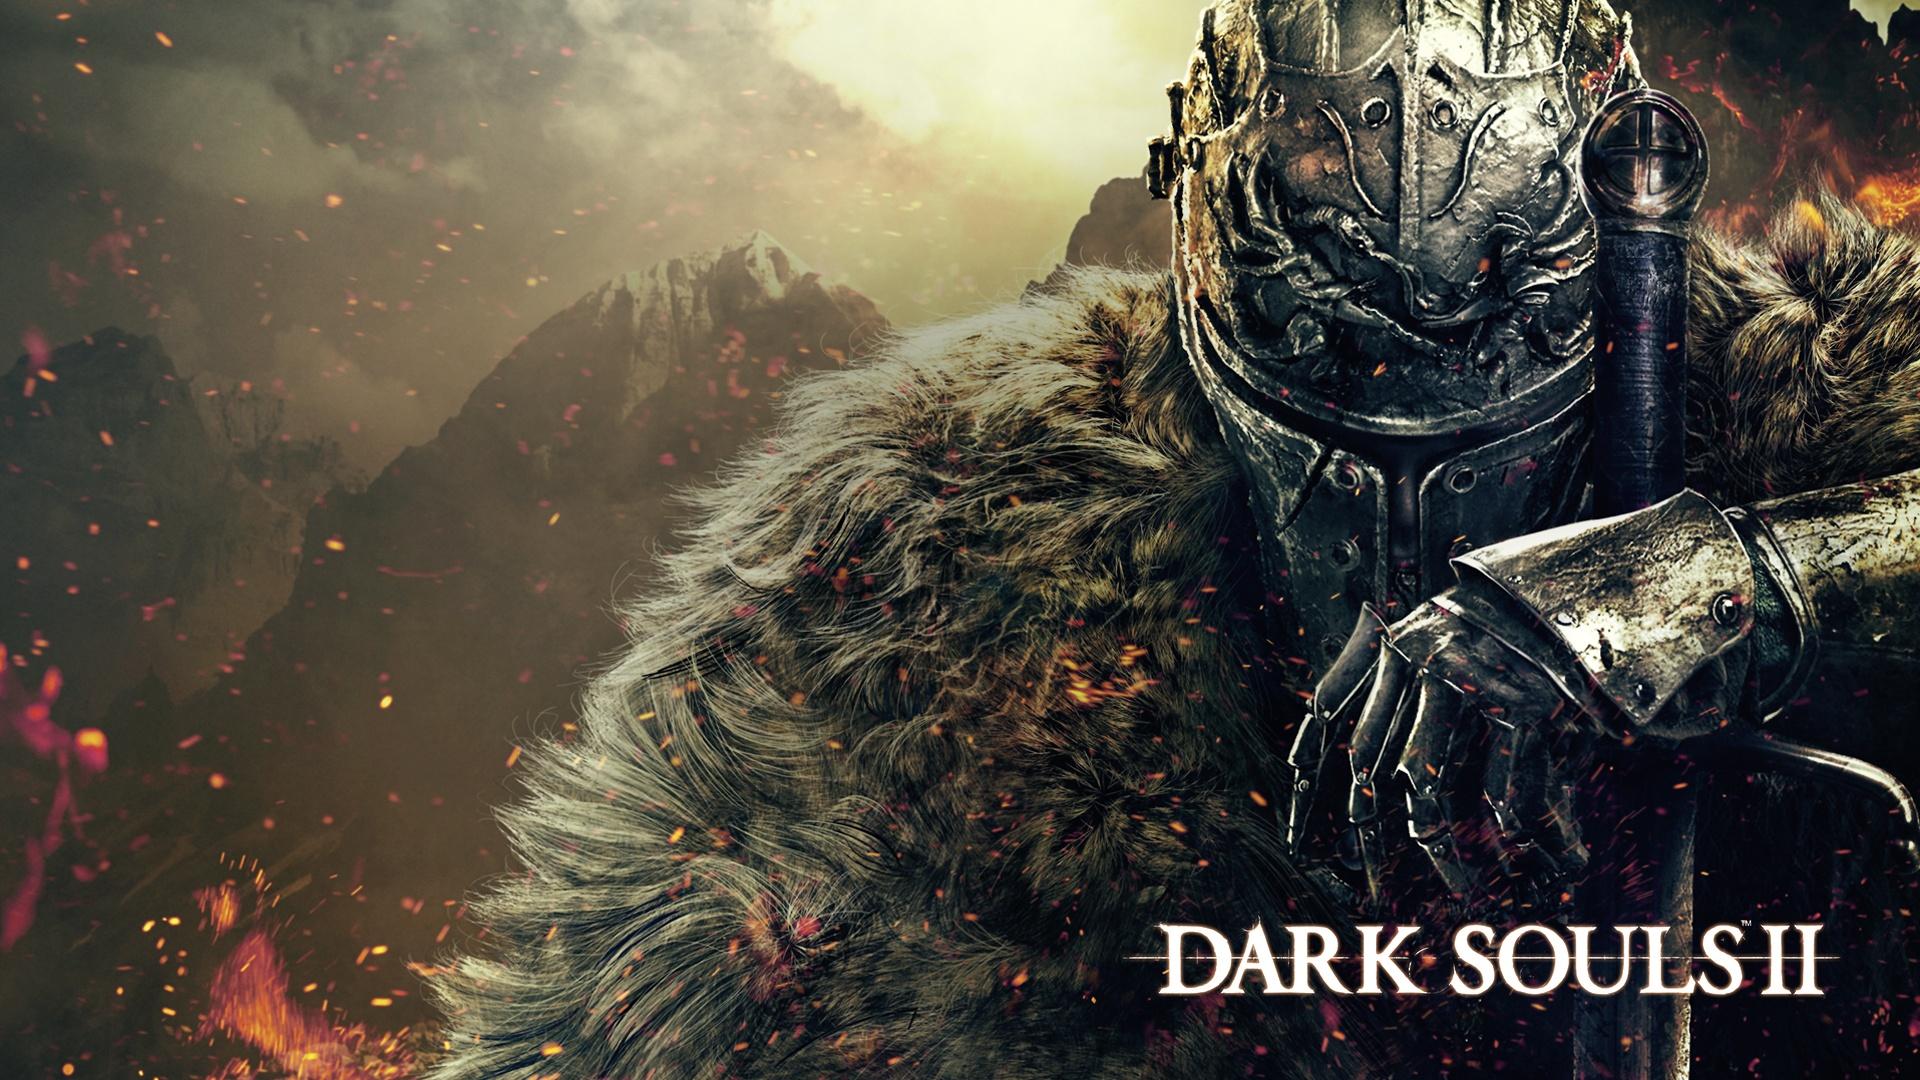 Dark Souls 2 14173 1920x1080 px ~ HDWallSource.com